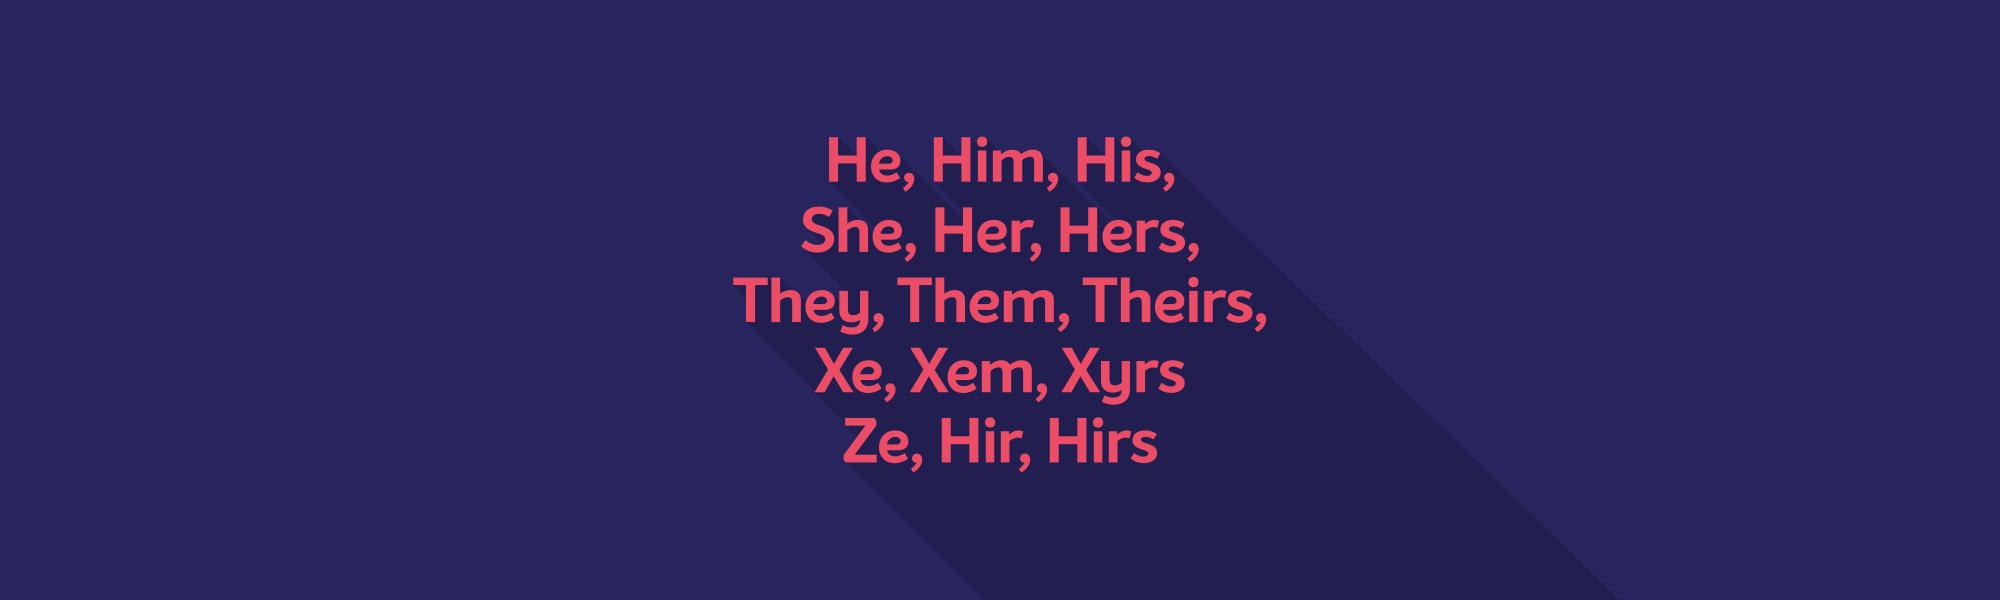 Full width banner pronouns